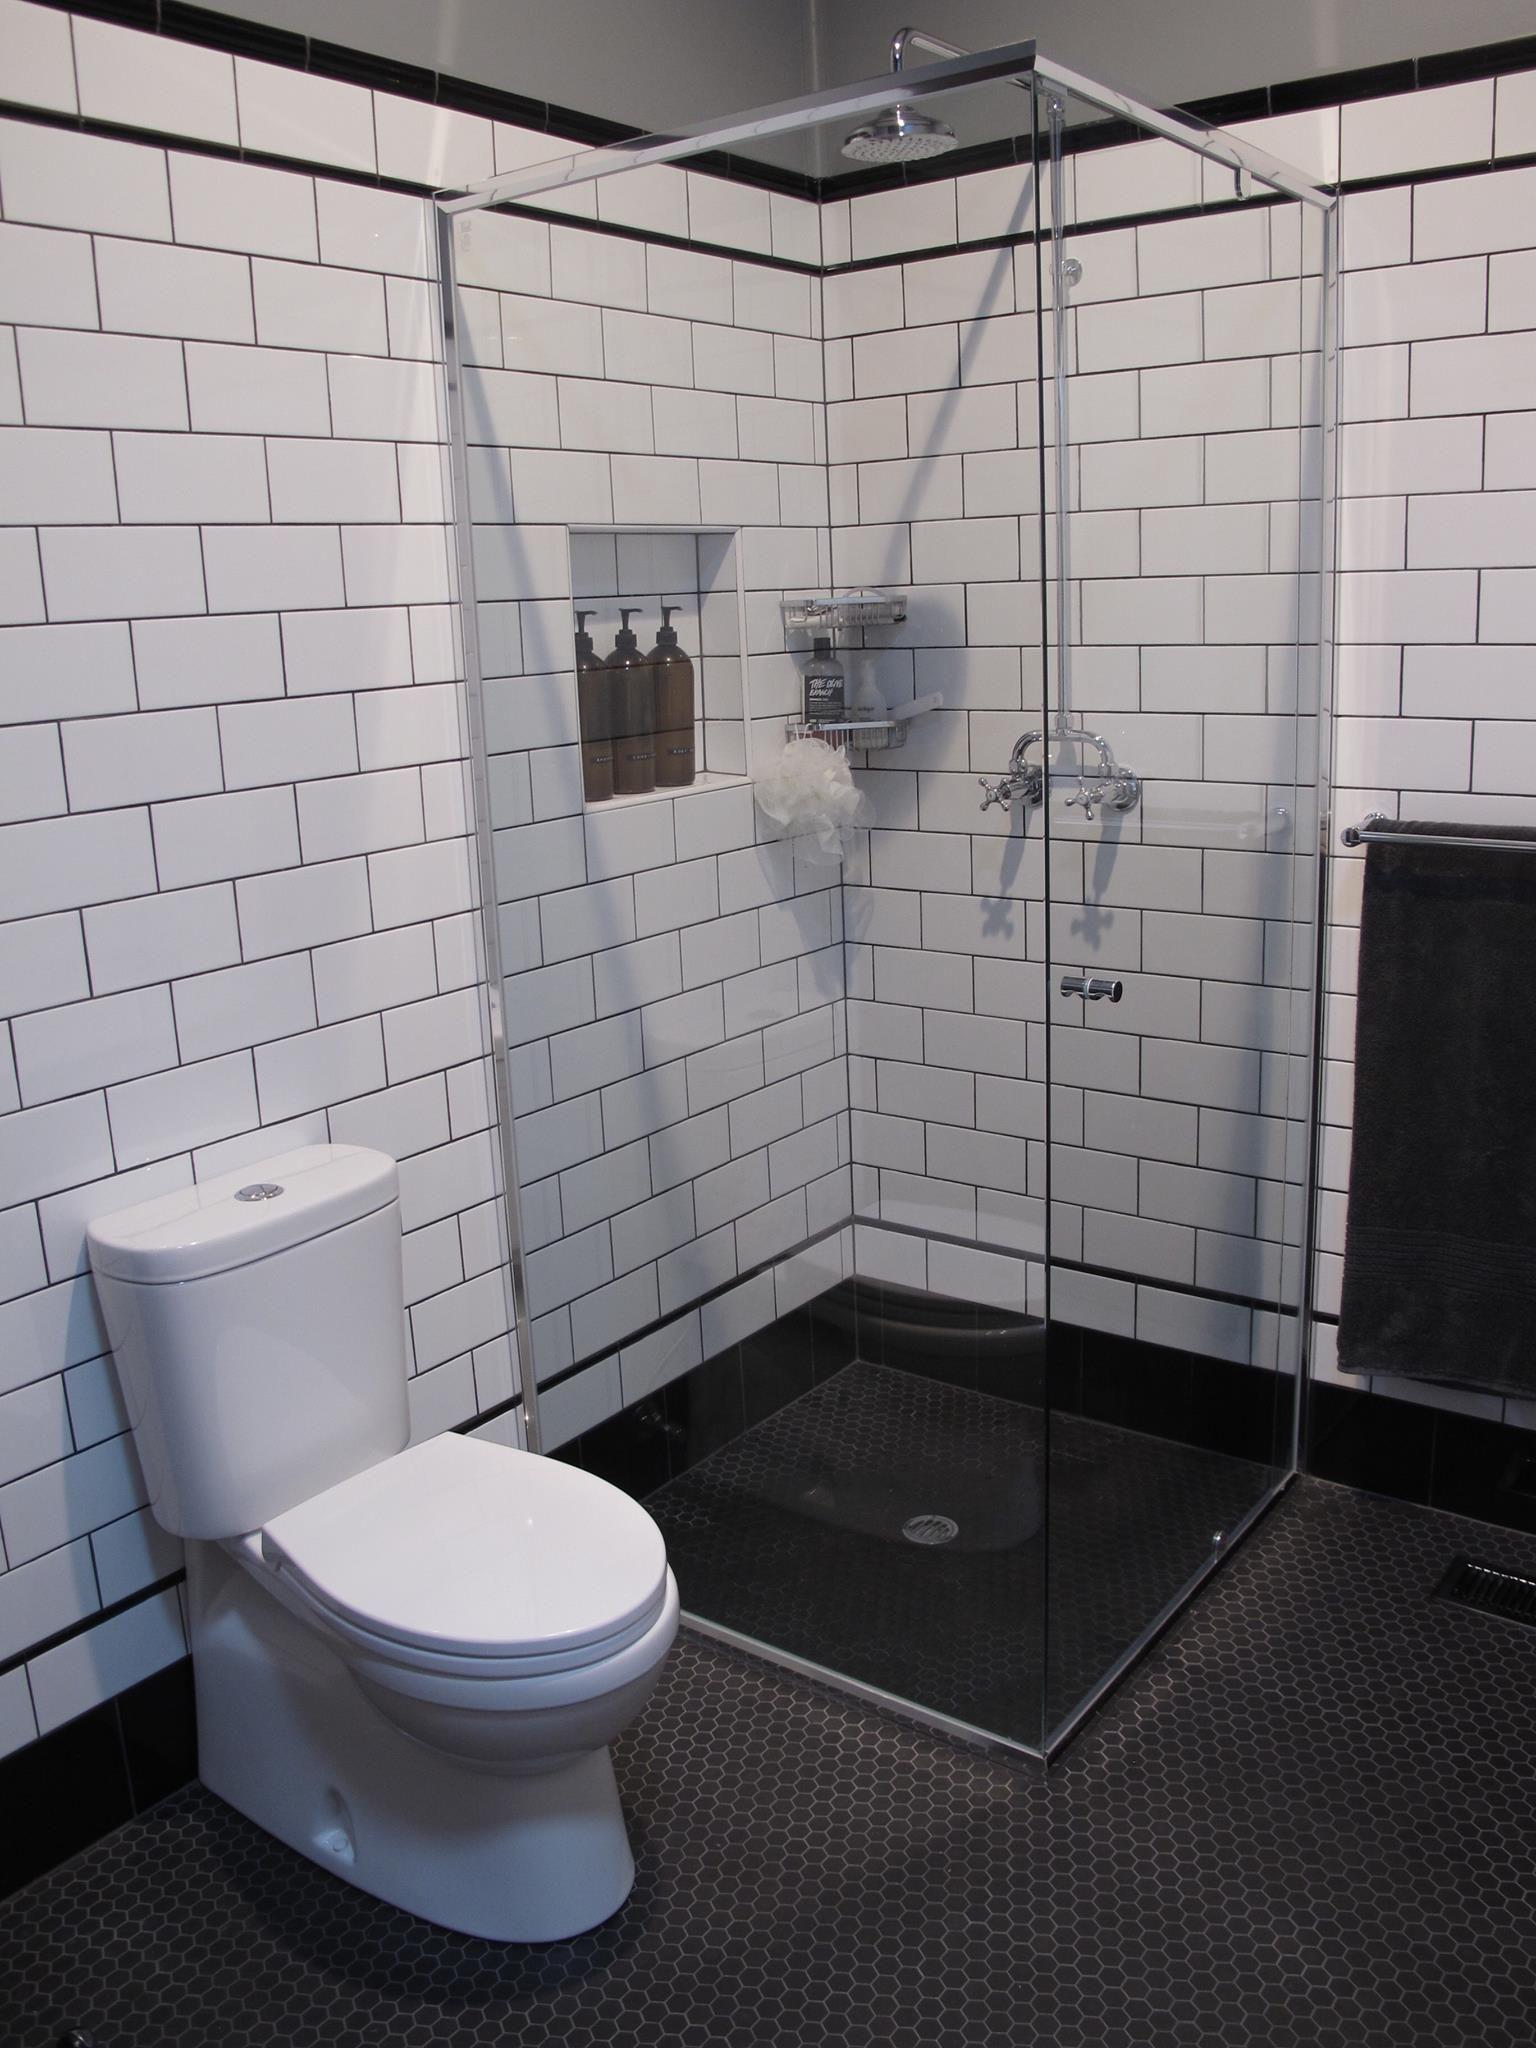 Black And White Subway Tiles Hexagonal Floor Art Deco Lines Cues